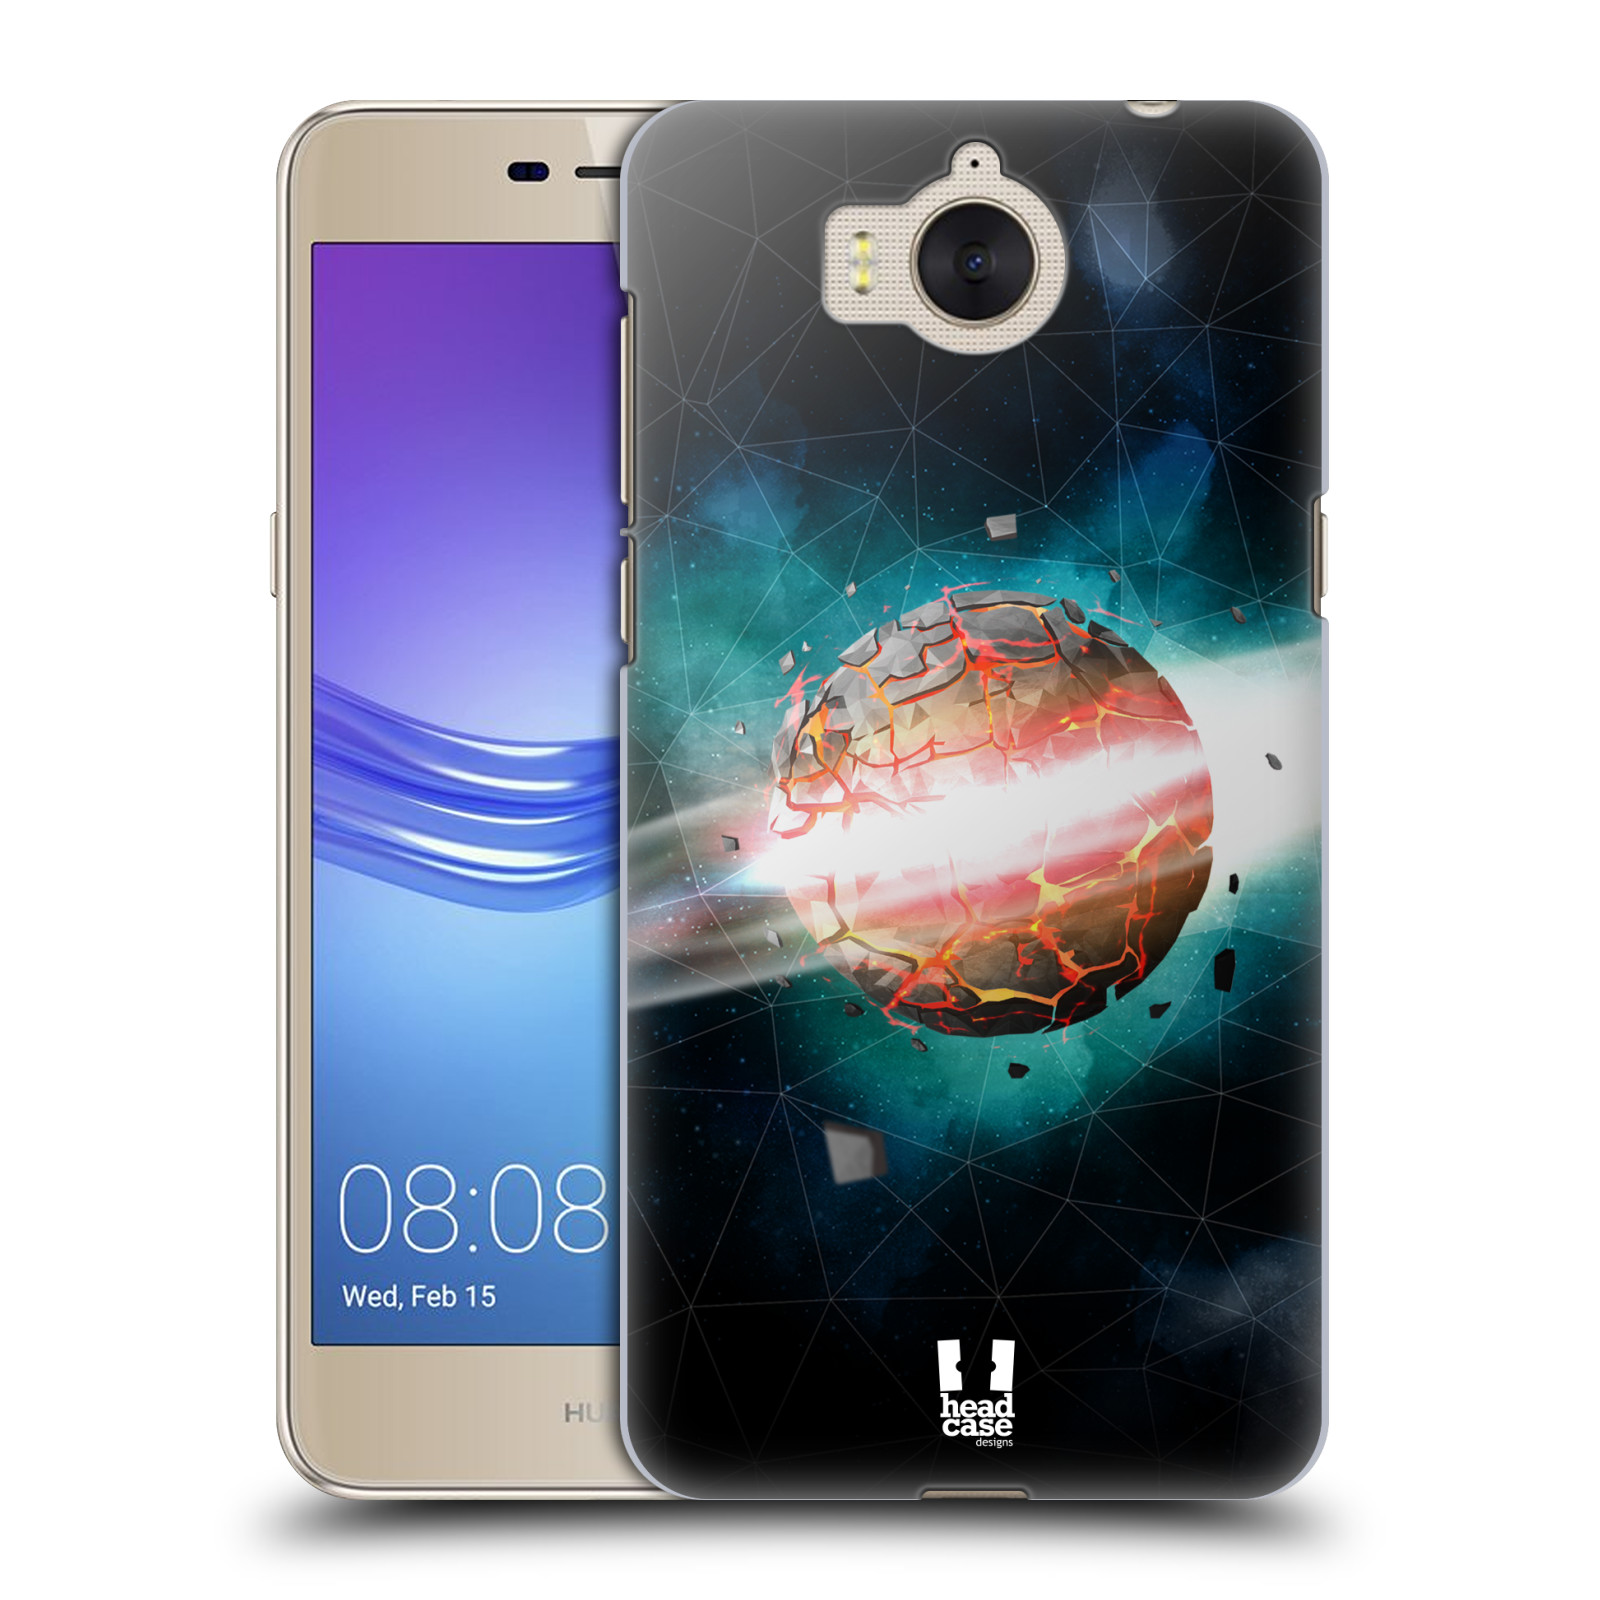 Plastové pouzdro na mobil Huawei Y6 2017 - Head Case - UNIVERSE EXPLOSION